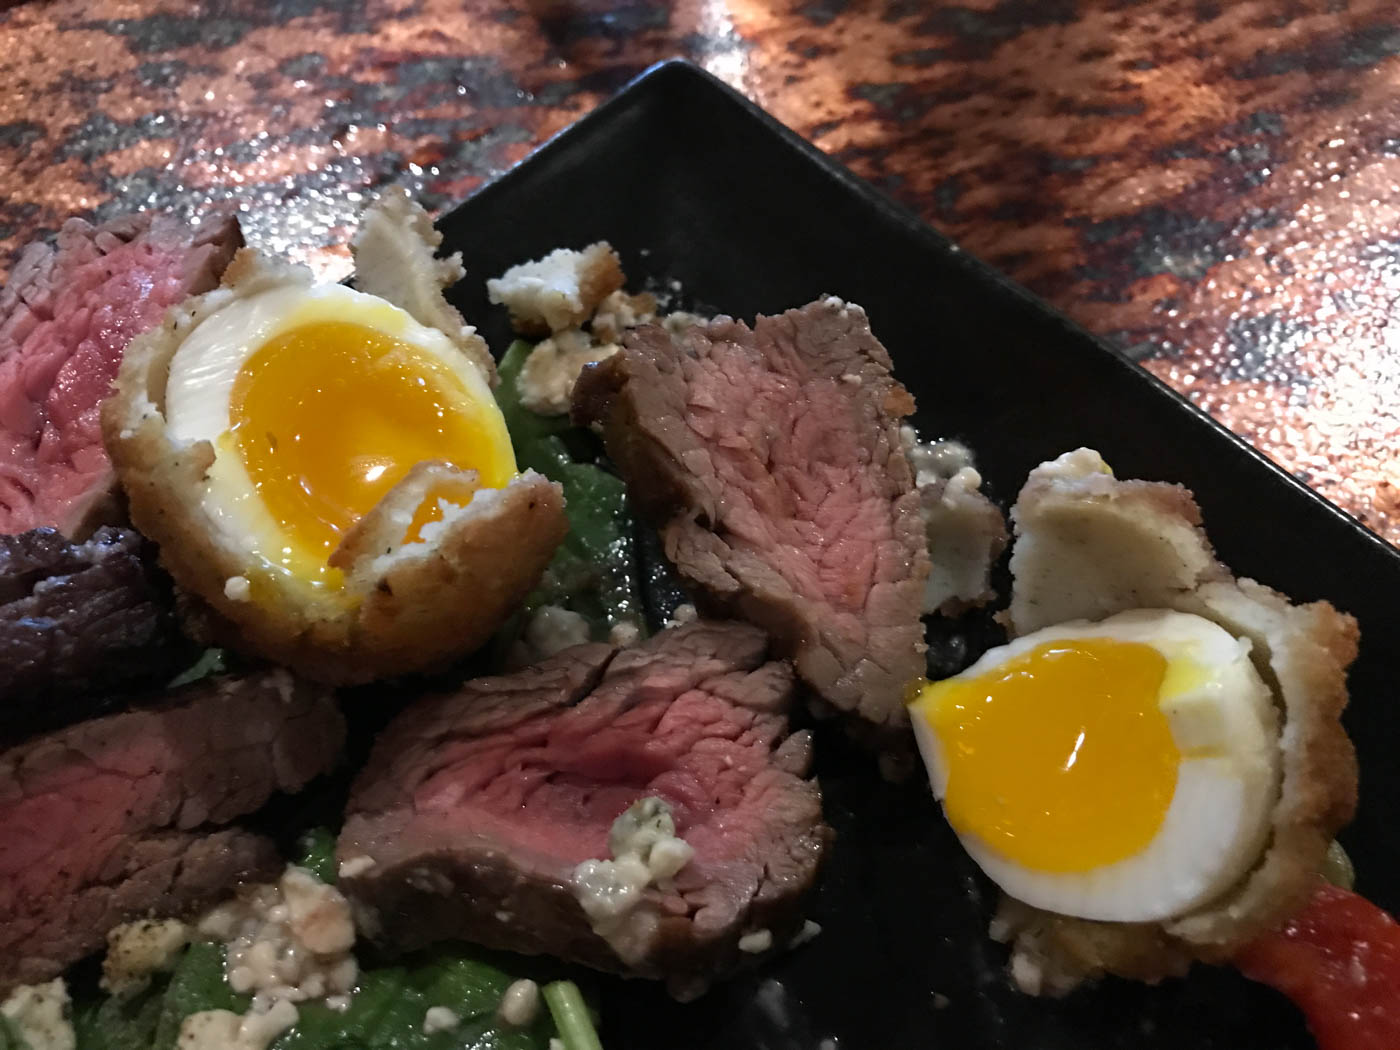 Deep fried egg and steak